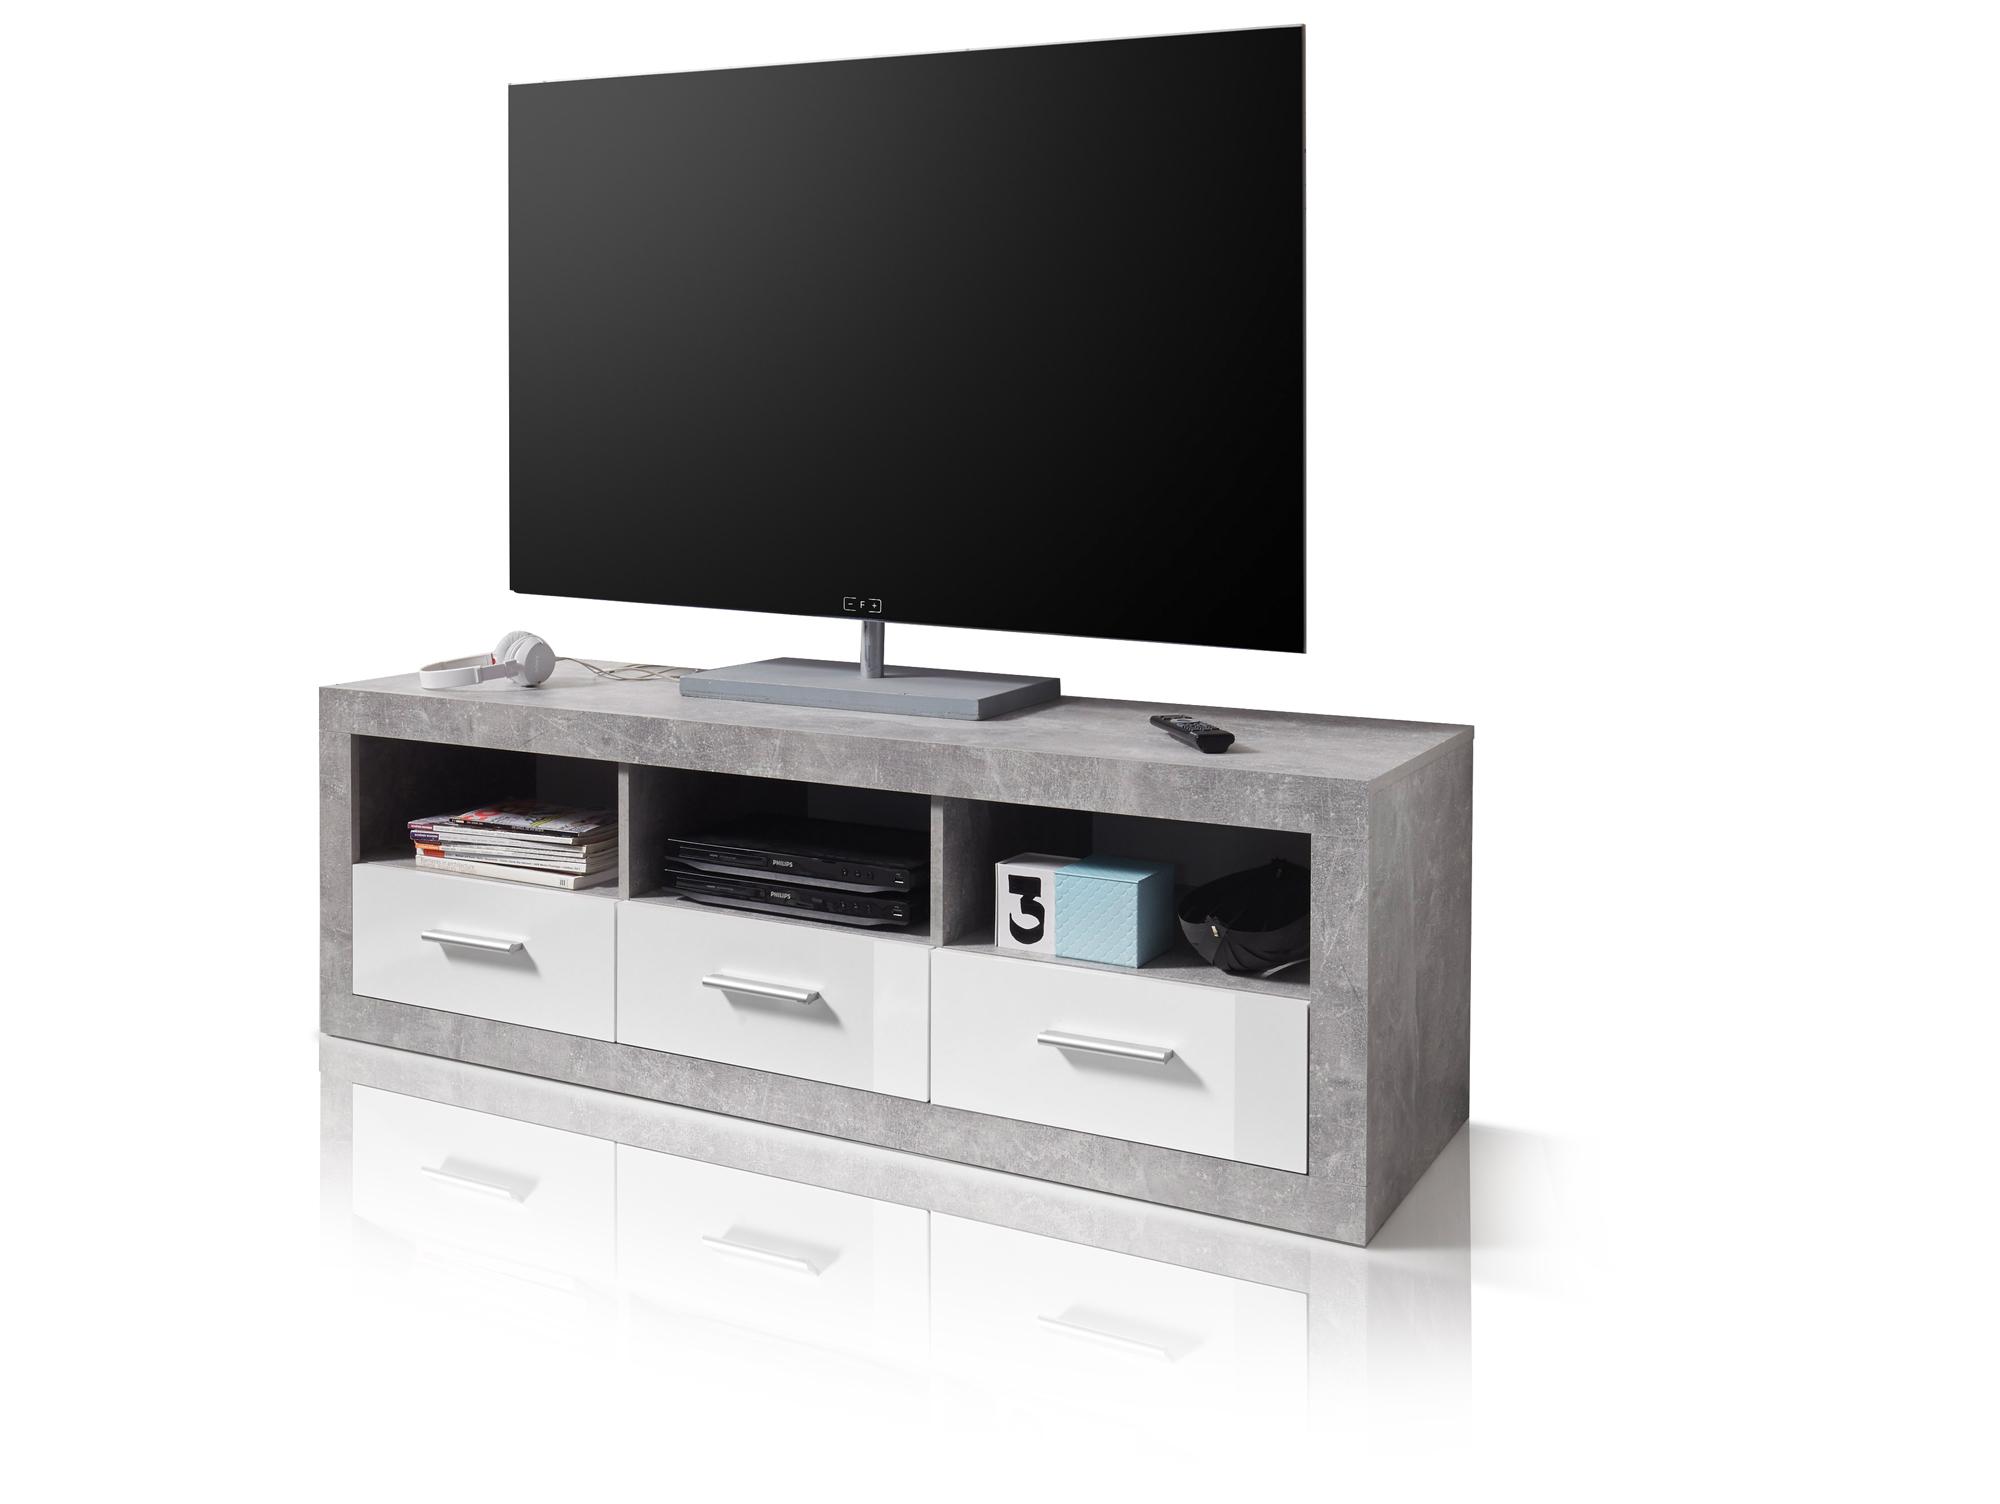 stella lowboard beton wei. Black Bedroom Furniture Sets. Home Design Ideas